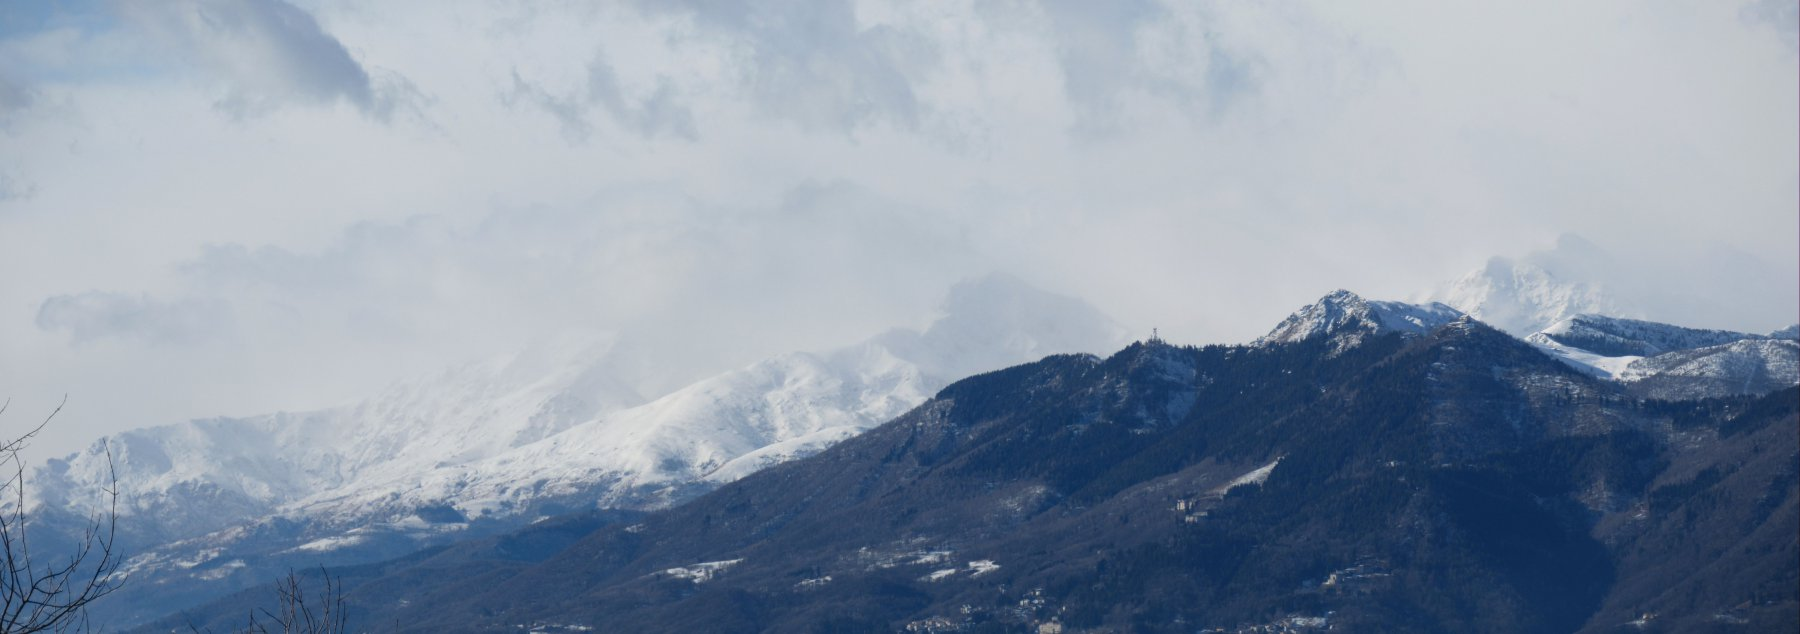 Tormenta sulle montagne biellesi